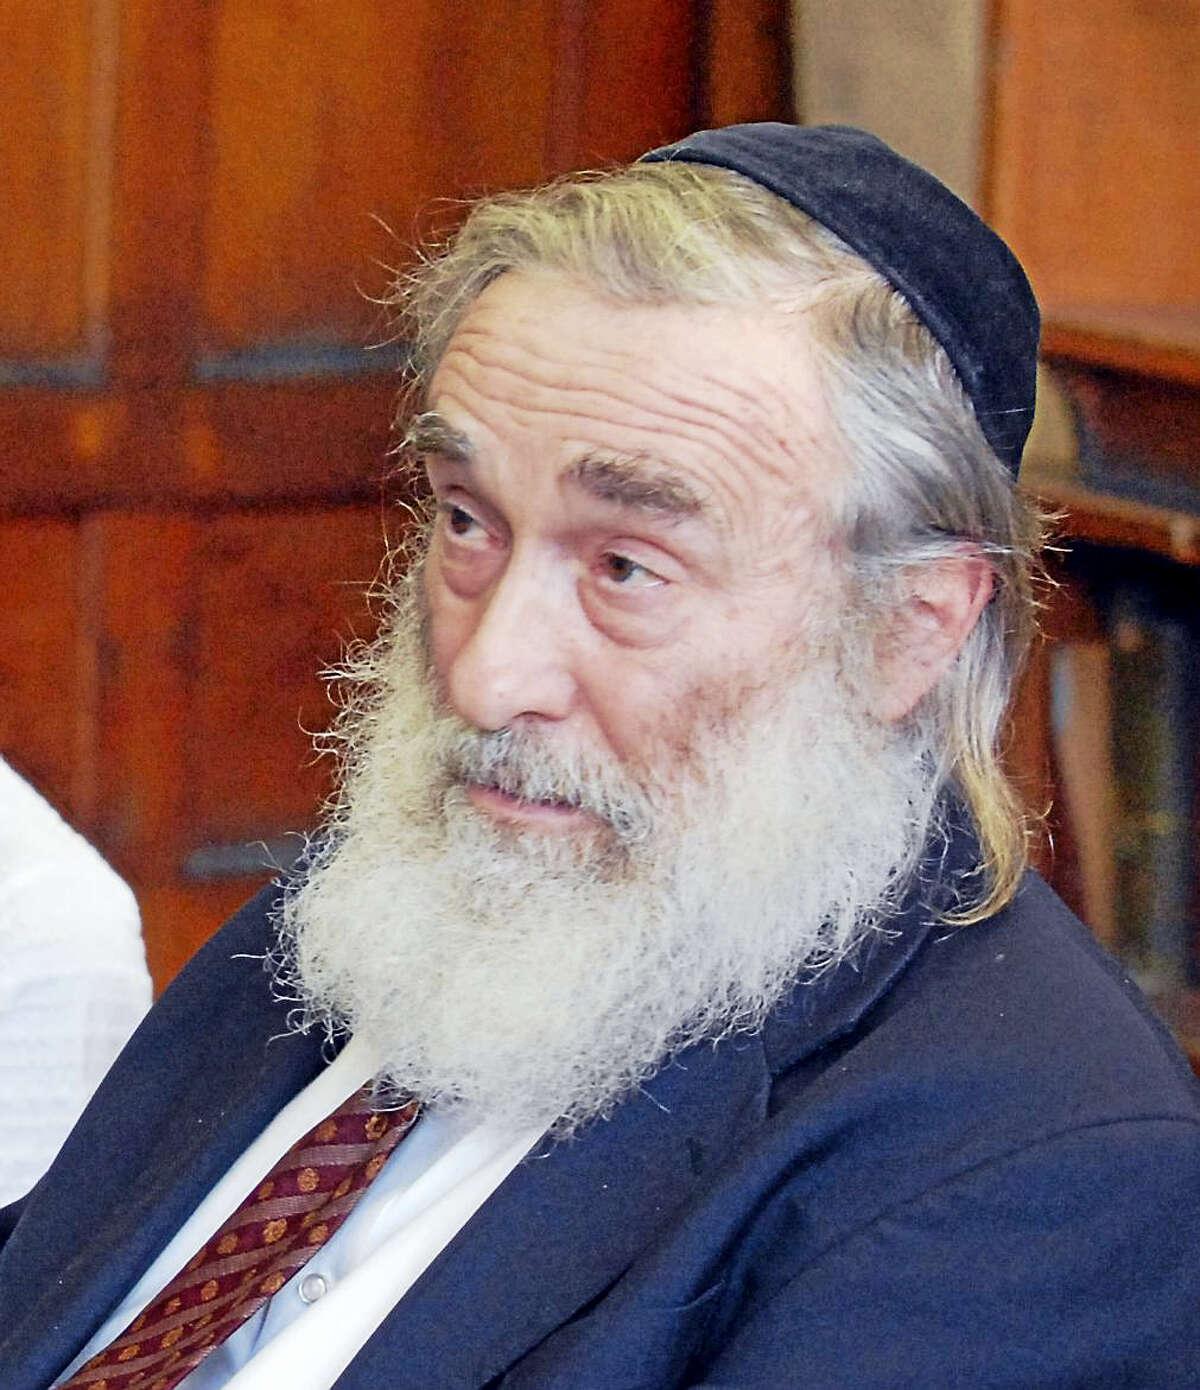 Rabbi Daniel Greer of New Haven